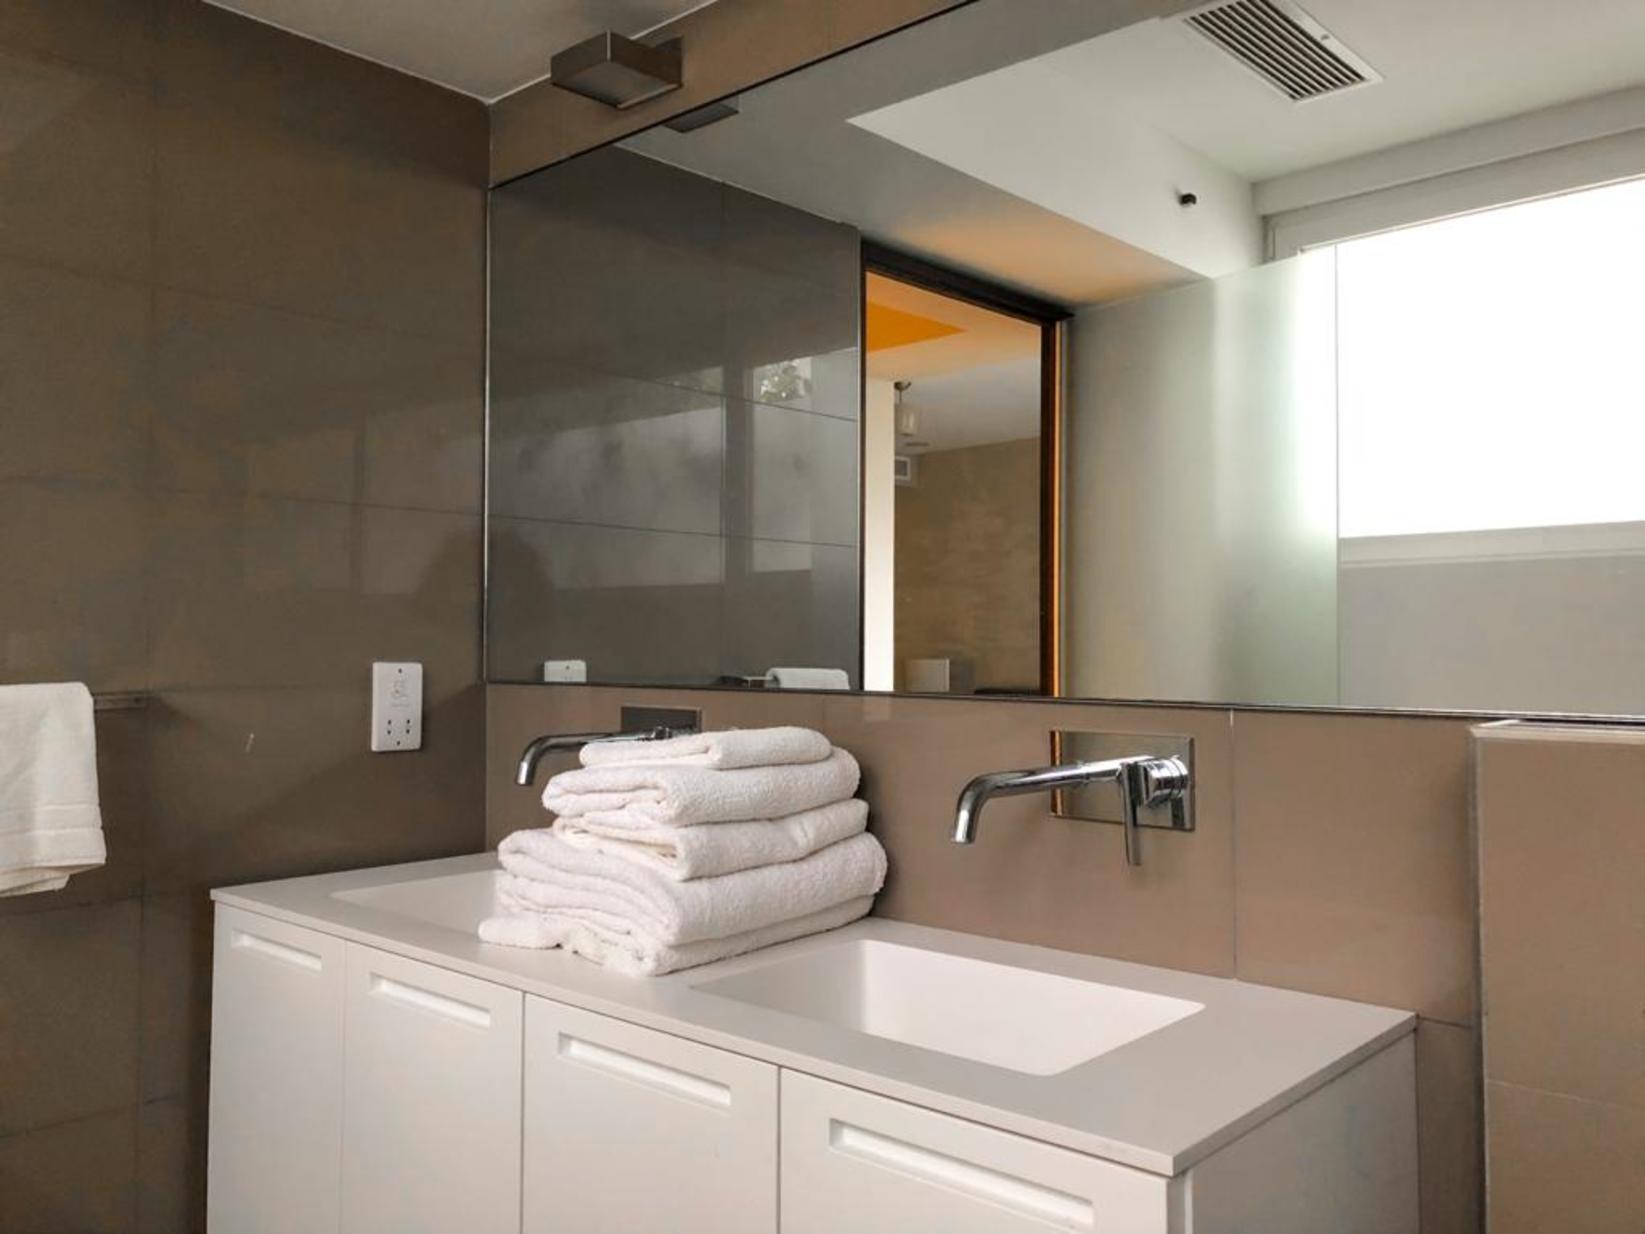 3 bed Villa For Rent in Bahar ic-Caghaq, Bahar ic-Caghaq - thumb 18